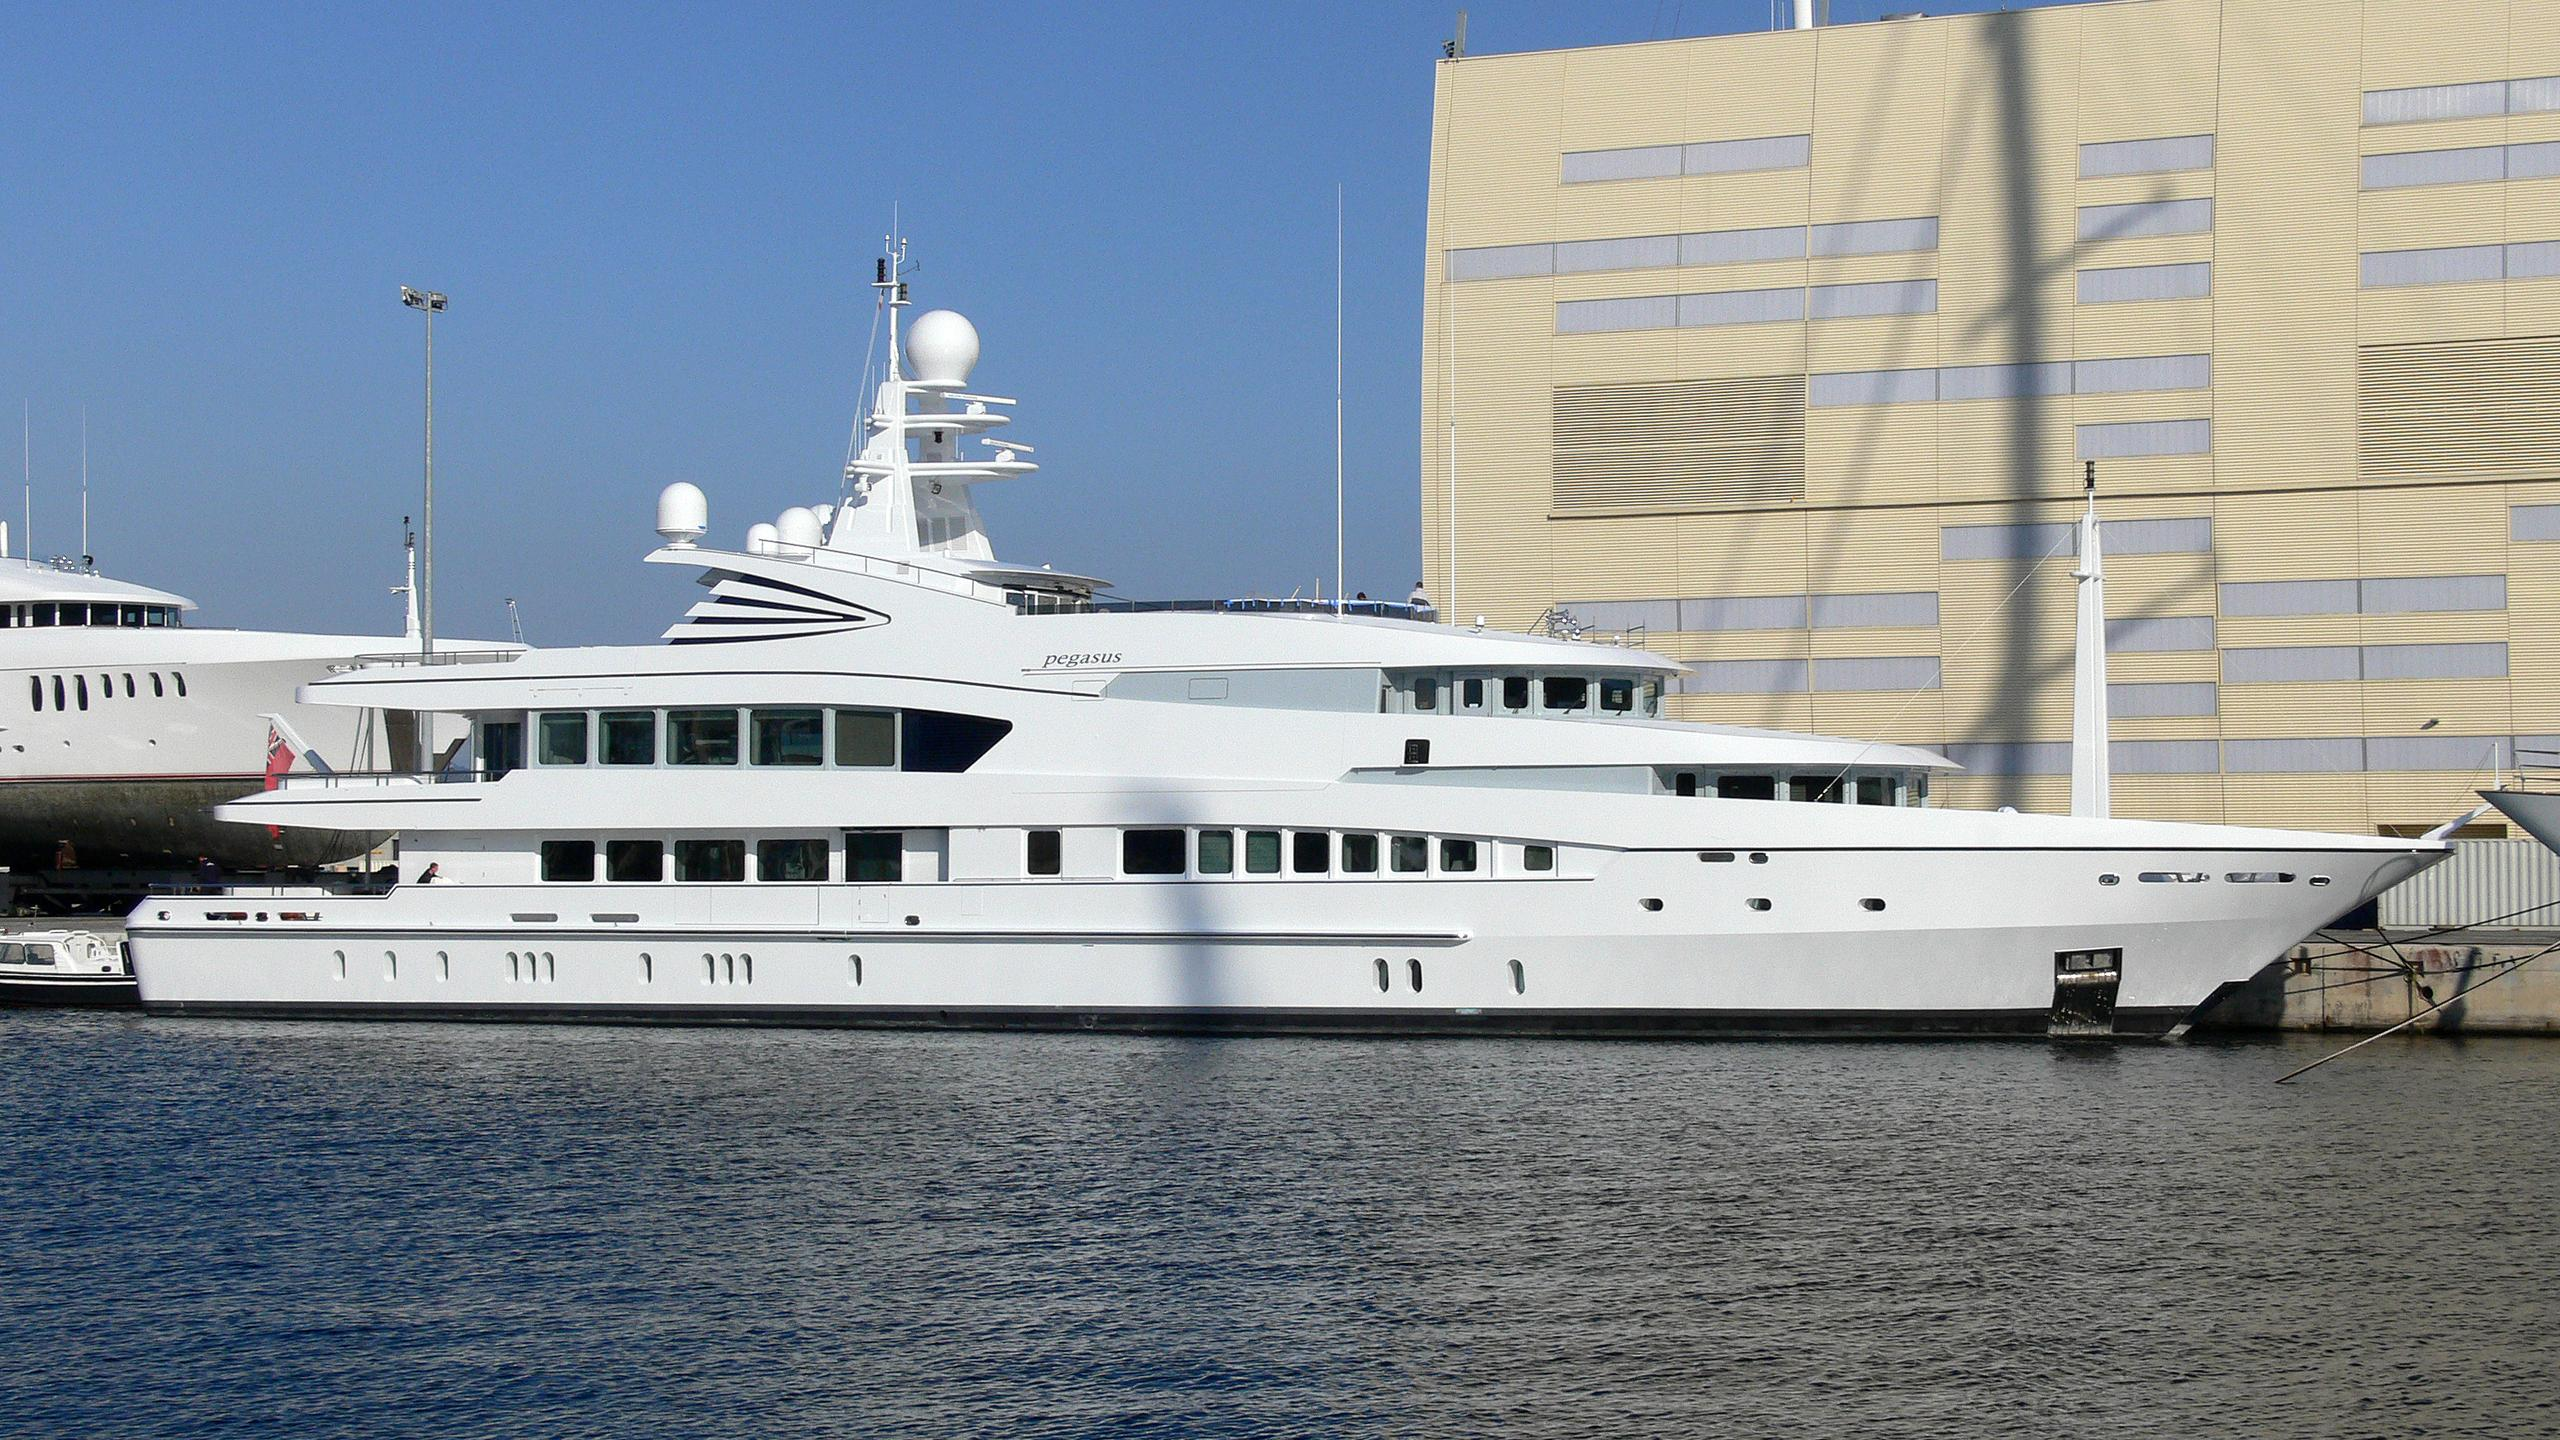 sea-pearl-motor-yacht-oceanco-2004-60m-profile